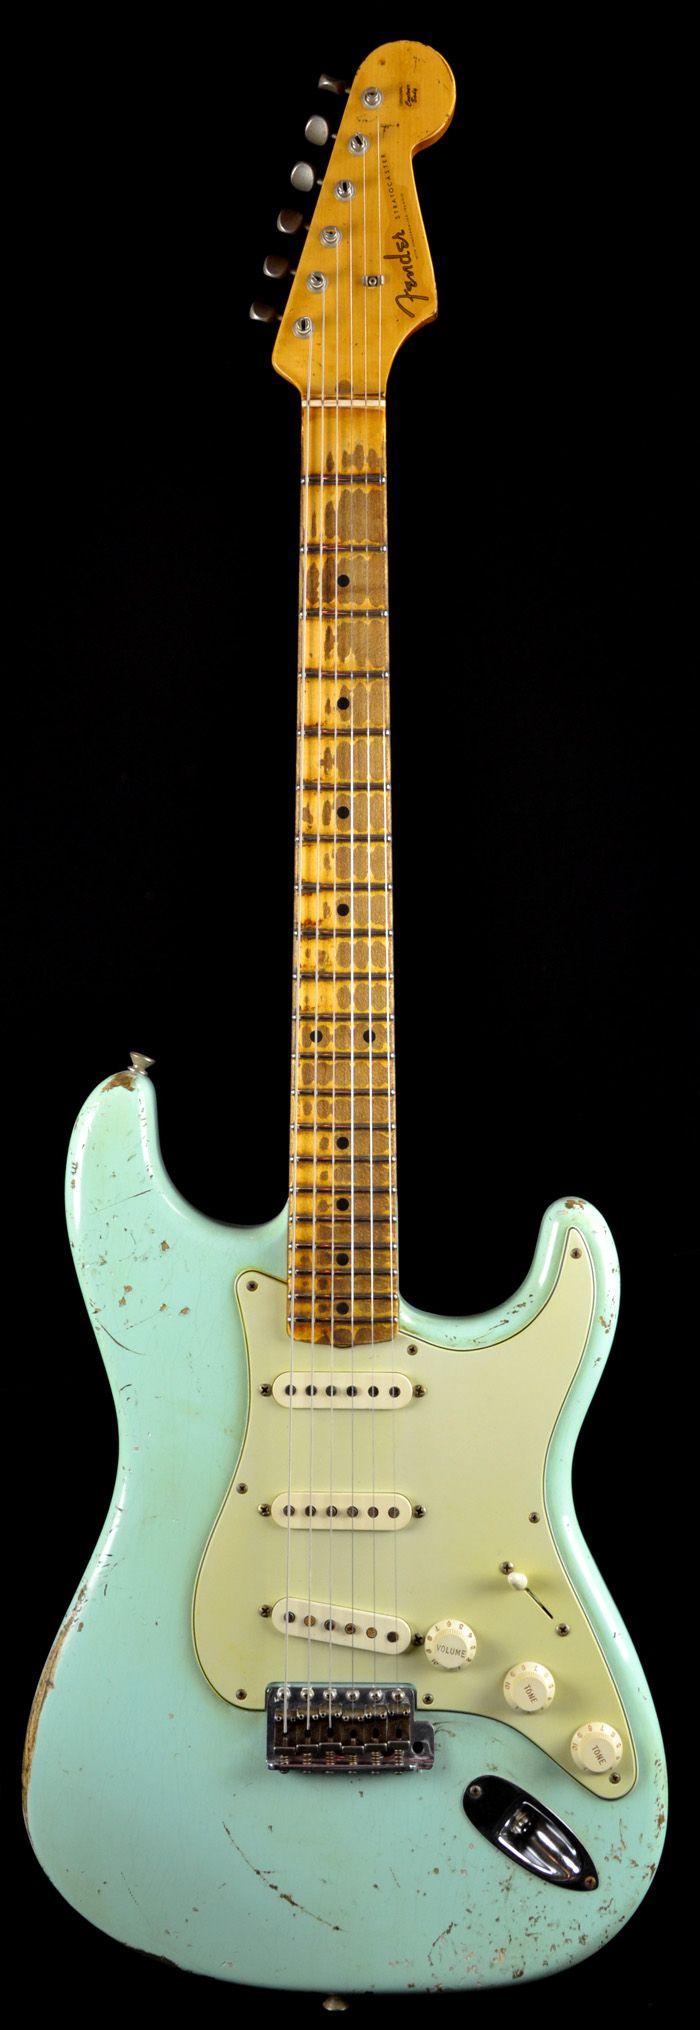 Fender Custom Shop 1956 Heavy Relic Stratocaster Surf Green